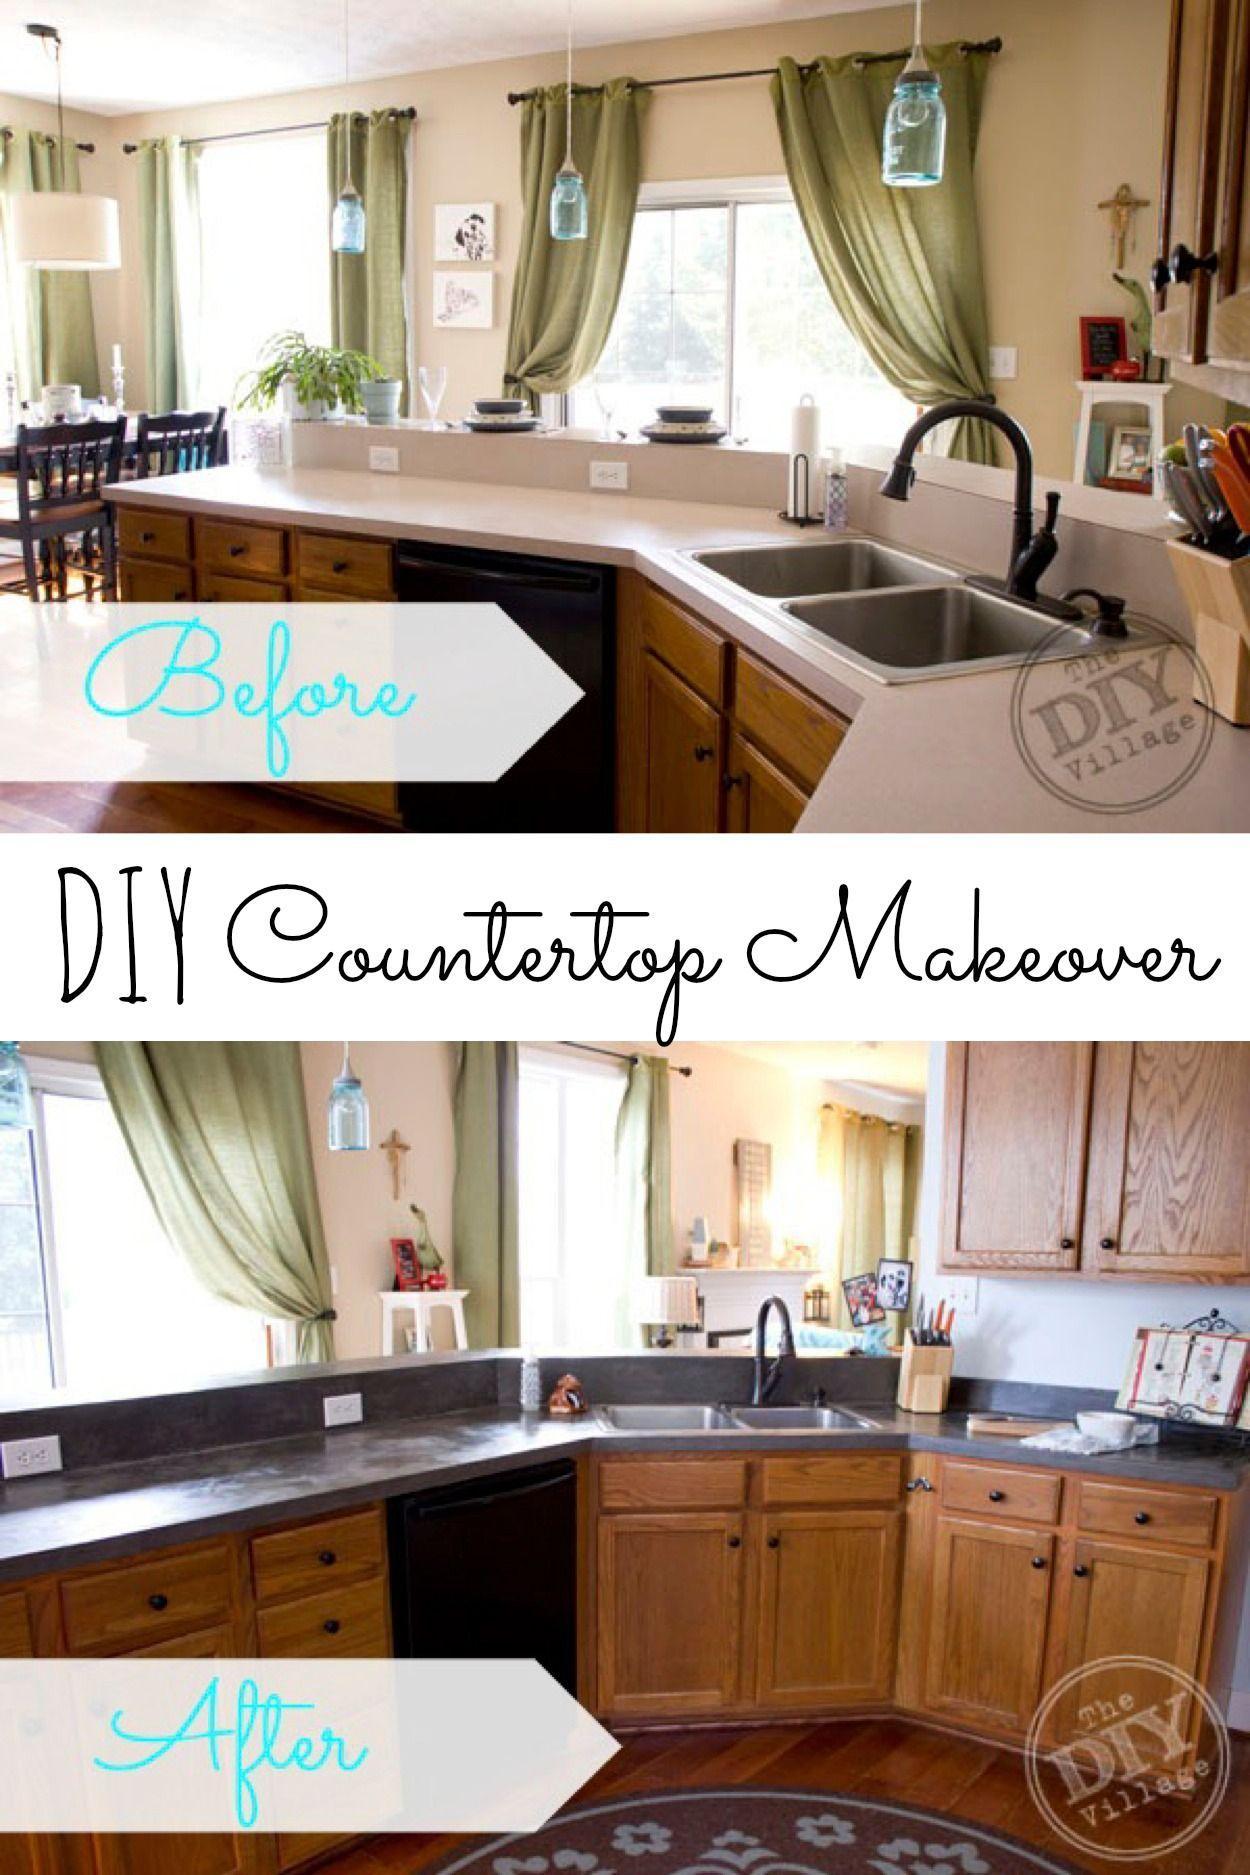 Kitchen Countertop Makeover The Diy Village Diy Countertops